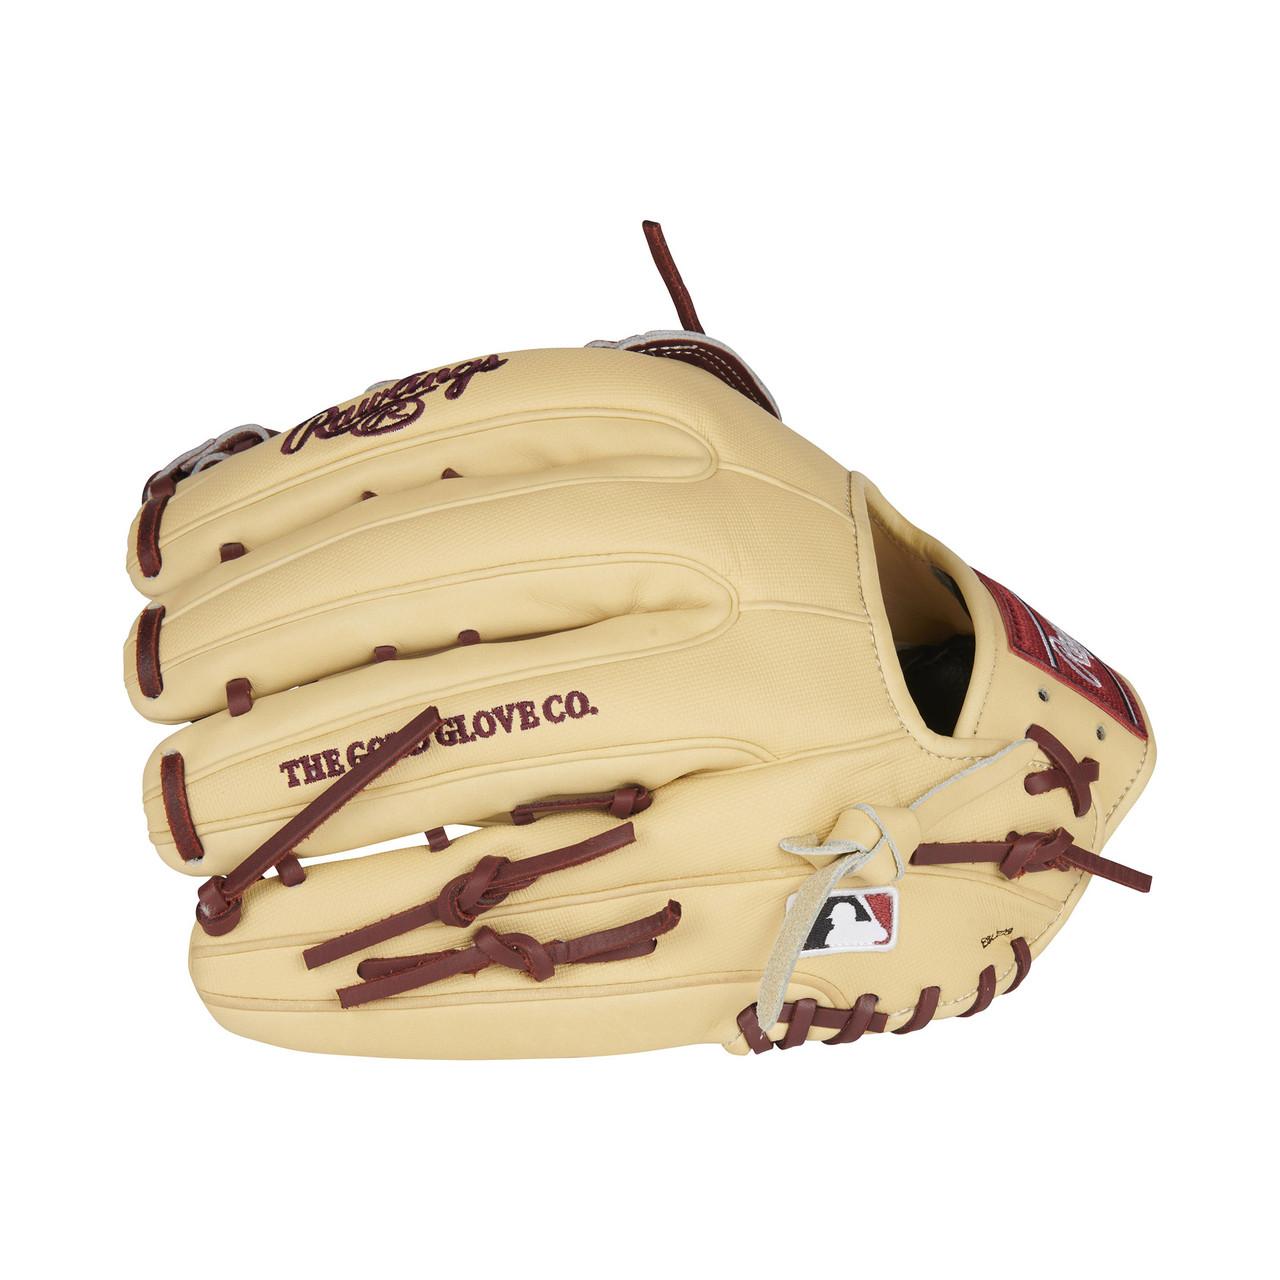 Rawlings Heart of the Hide ColorSync 5.0 12.75 Inch PRO3319-6CSH Baseball Glove